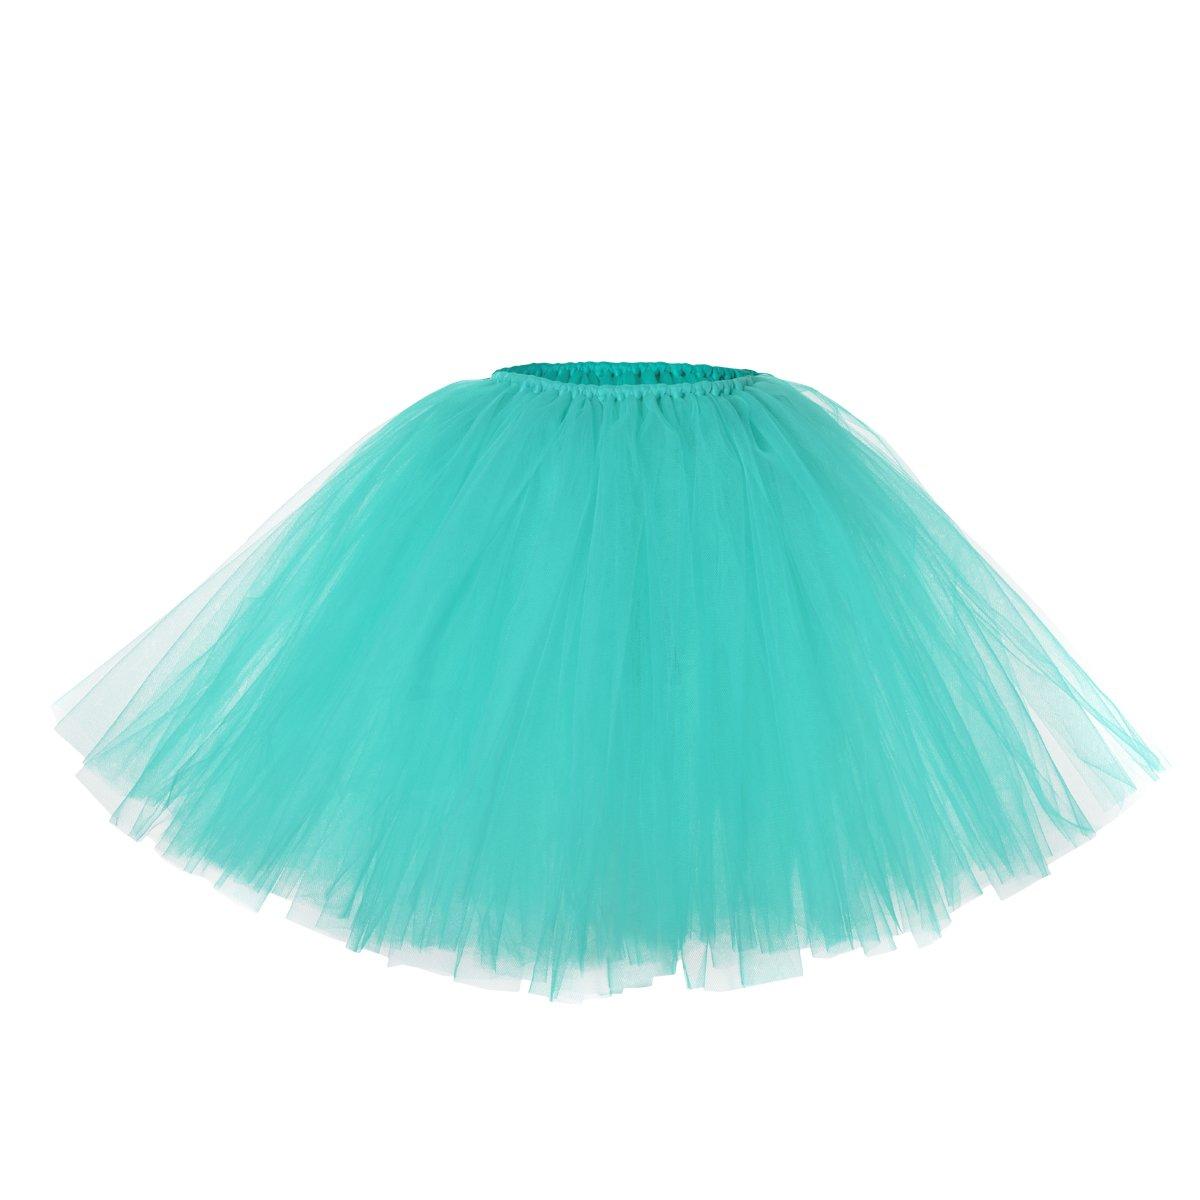 Flyingtutu Baby Girls Partially Lined Handmade Tutu Skirts